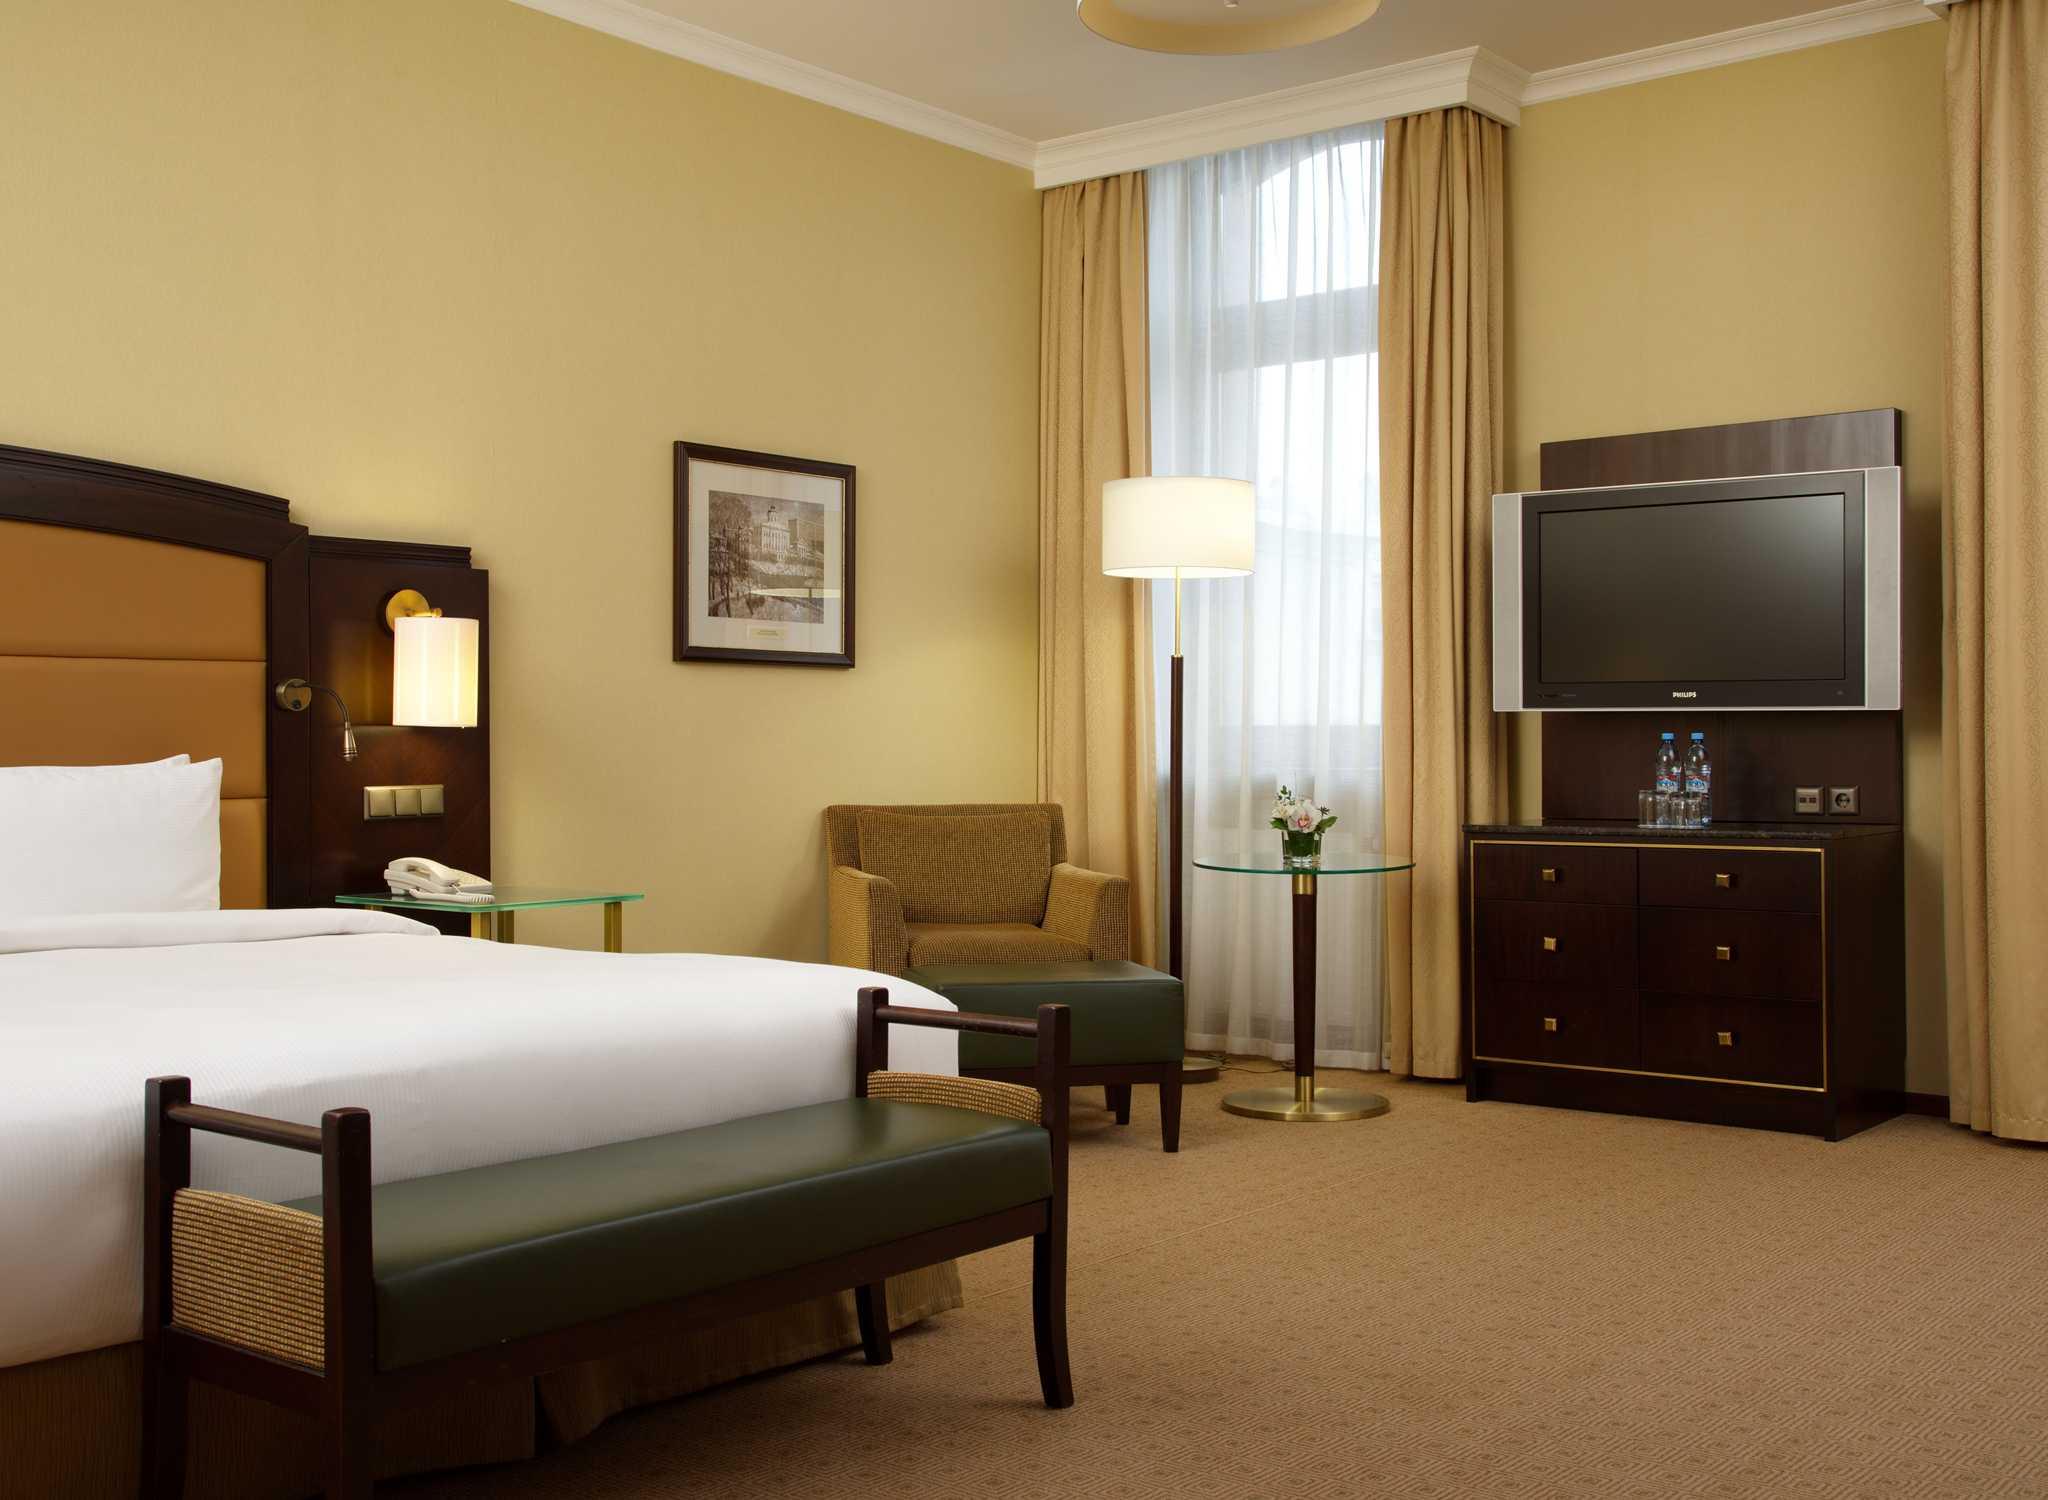 Hotels in Moskau – Hilton Moscow Leningradskaya – Russland